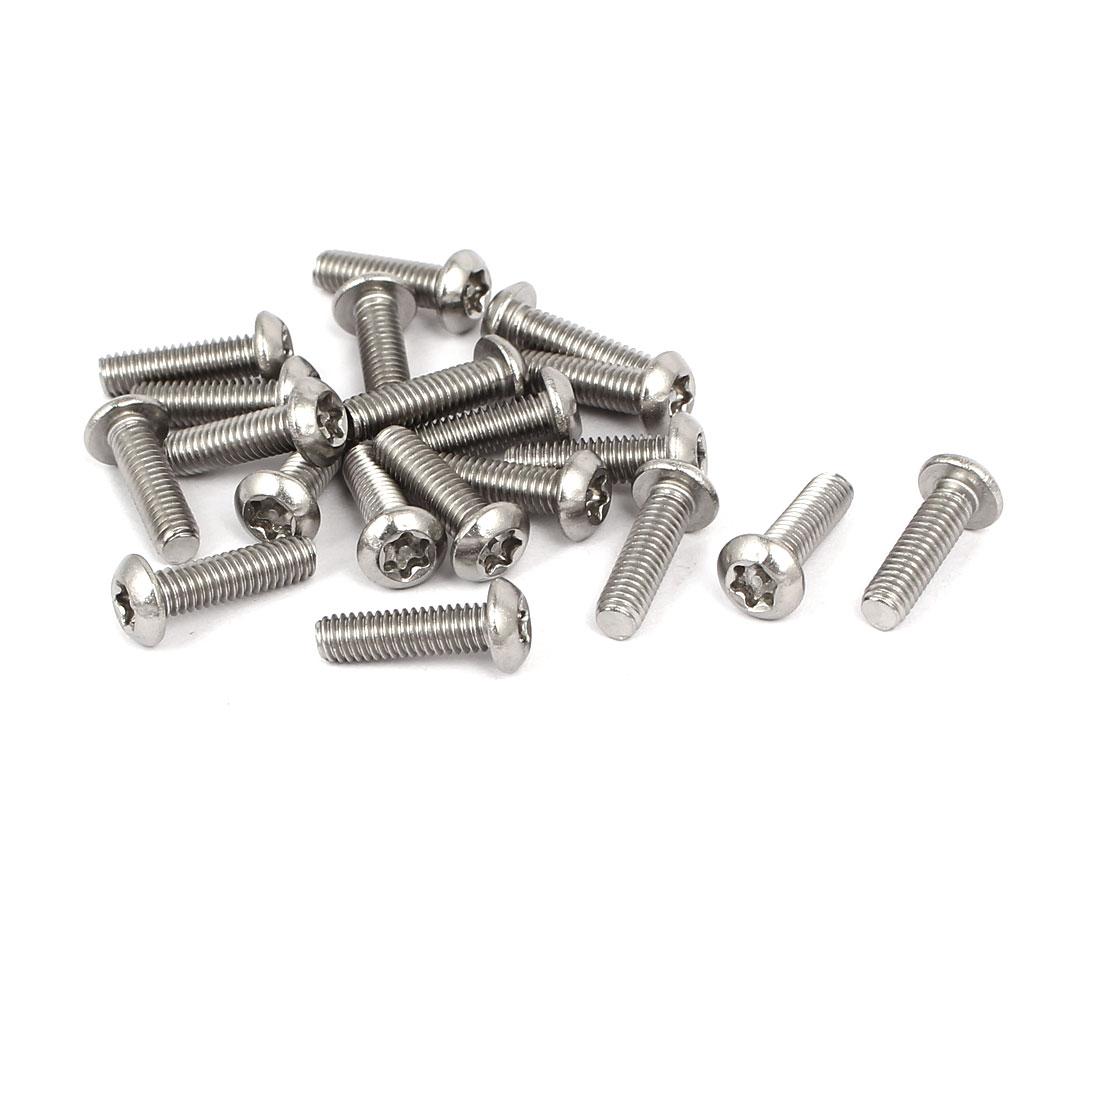 M4x14mm 304 Stainless Steel Button Head Torx Tamper Resistant Screws 20pcs